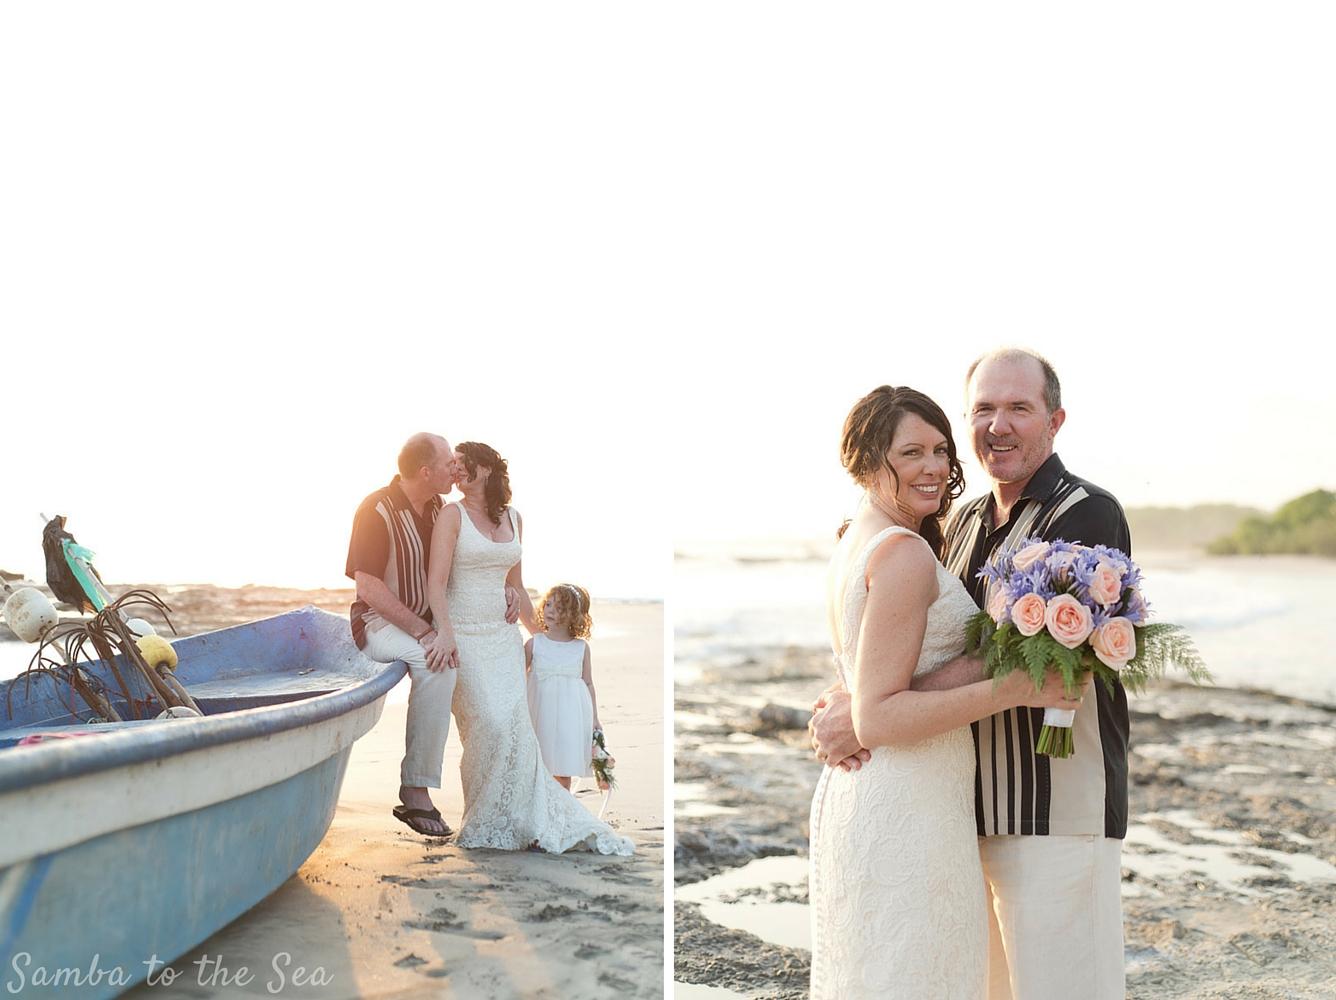 Wedding in Playa Pelada, Nosara, Costa Rica. Photographed by Kristen M. Brown, Samba to the Sea Photography.